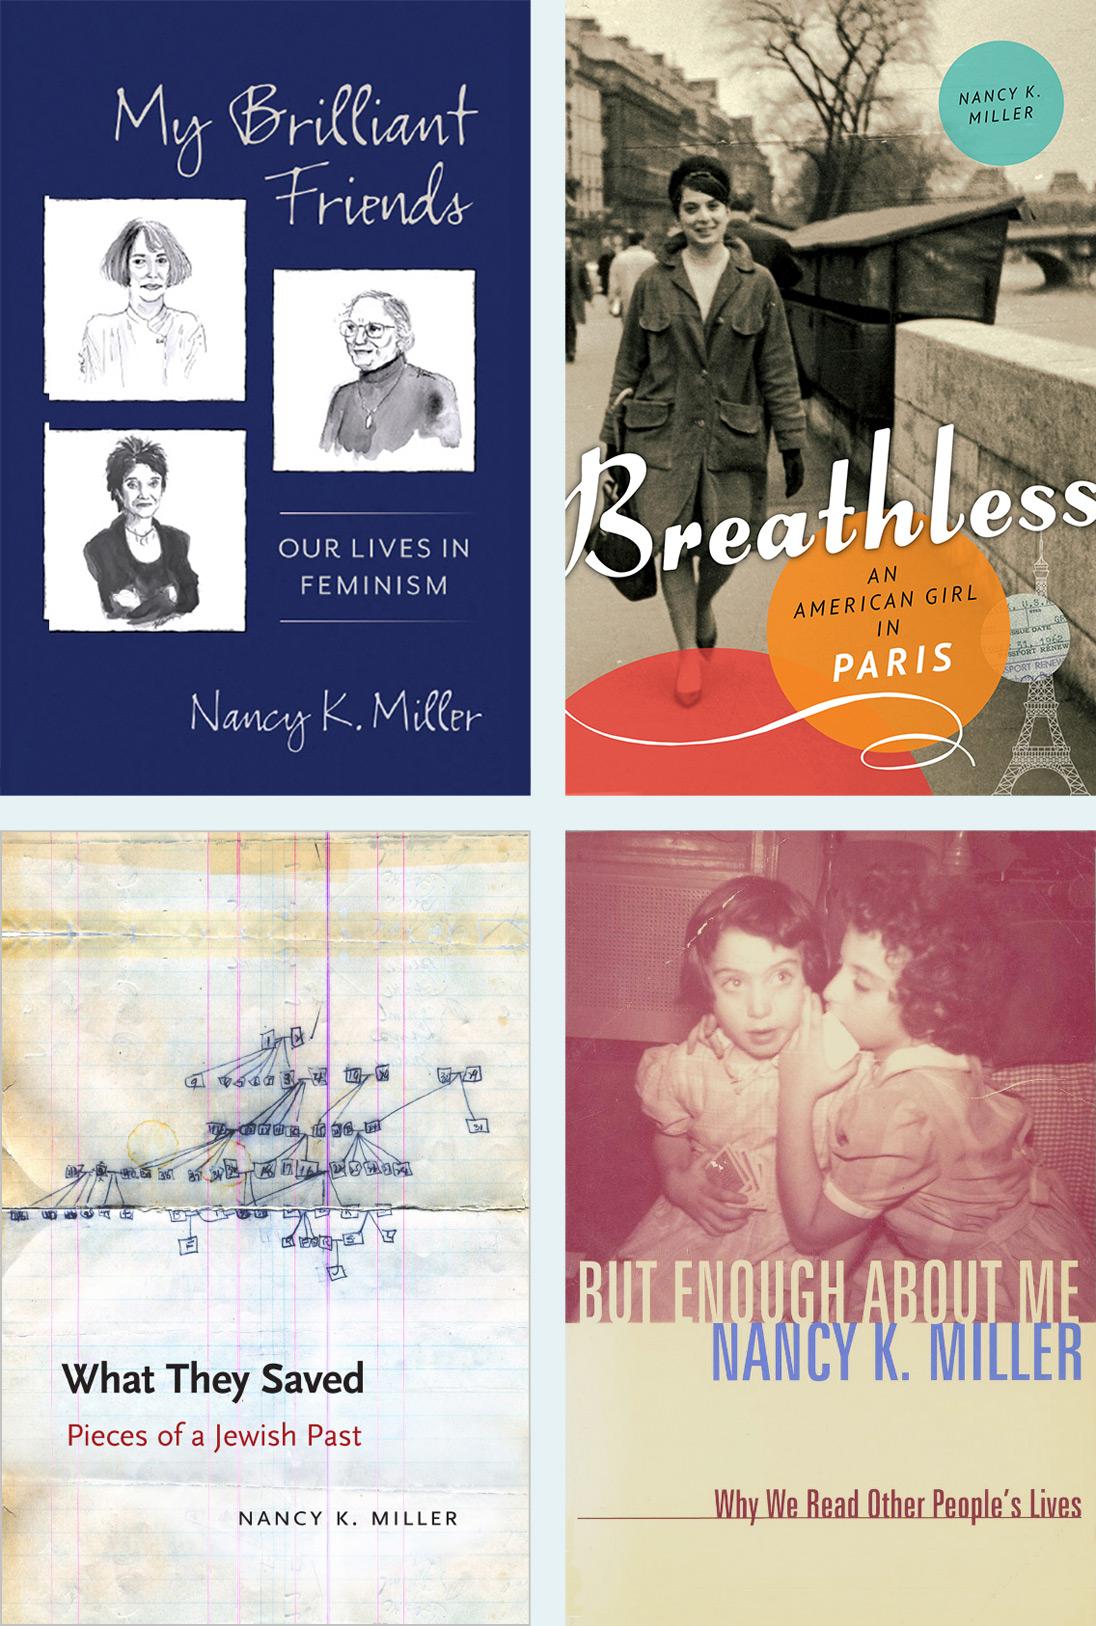 Nancy K. Miller books